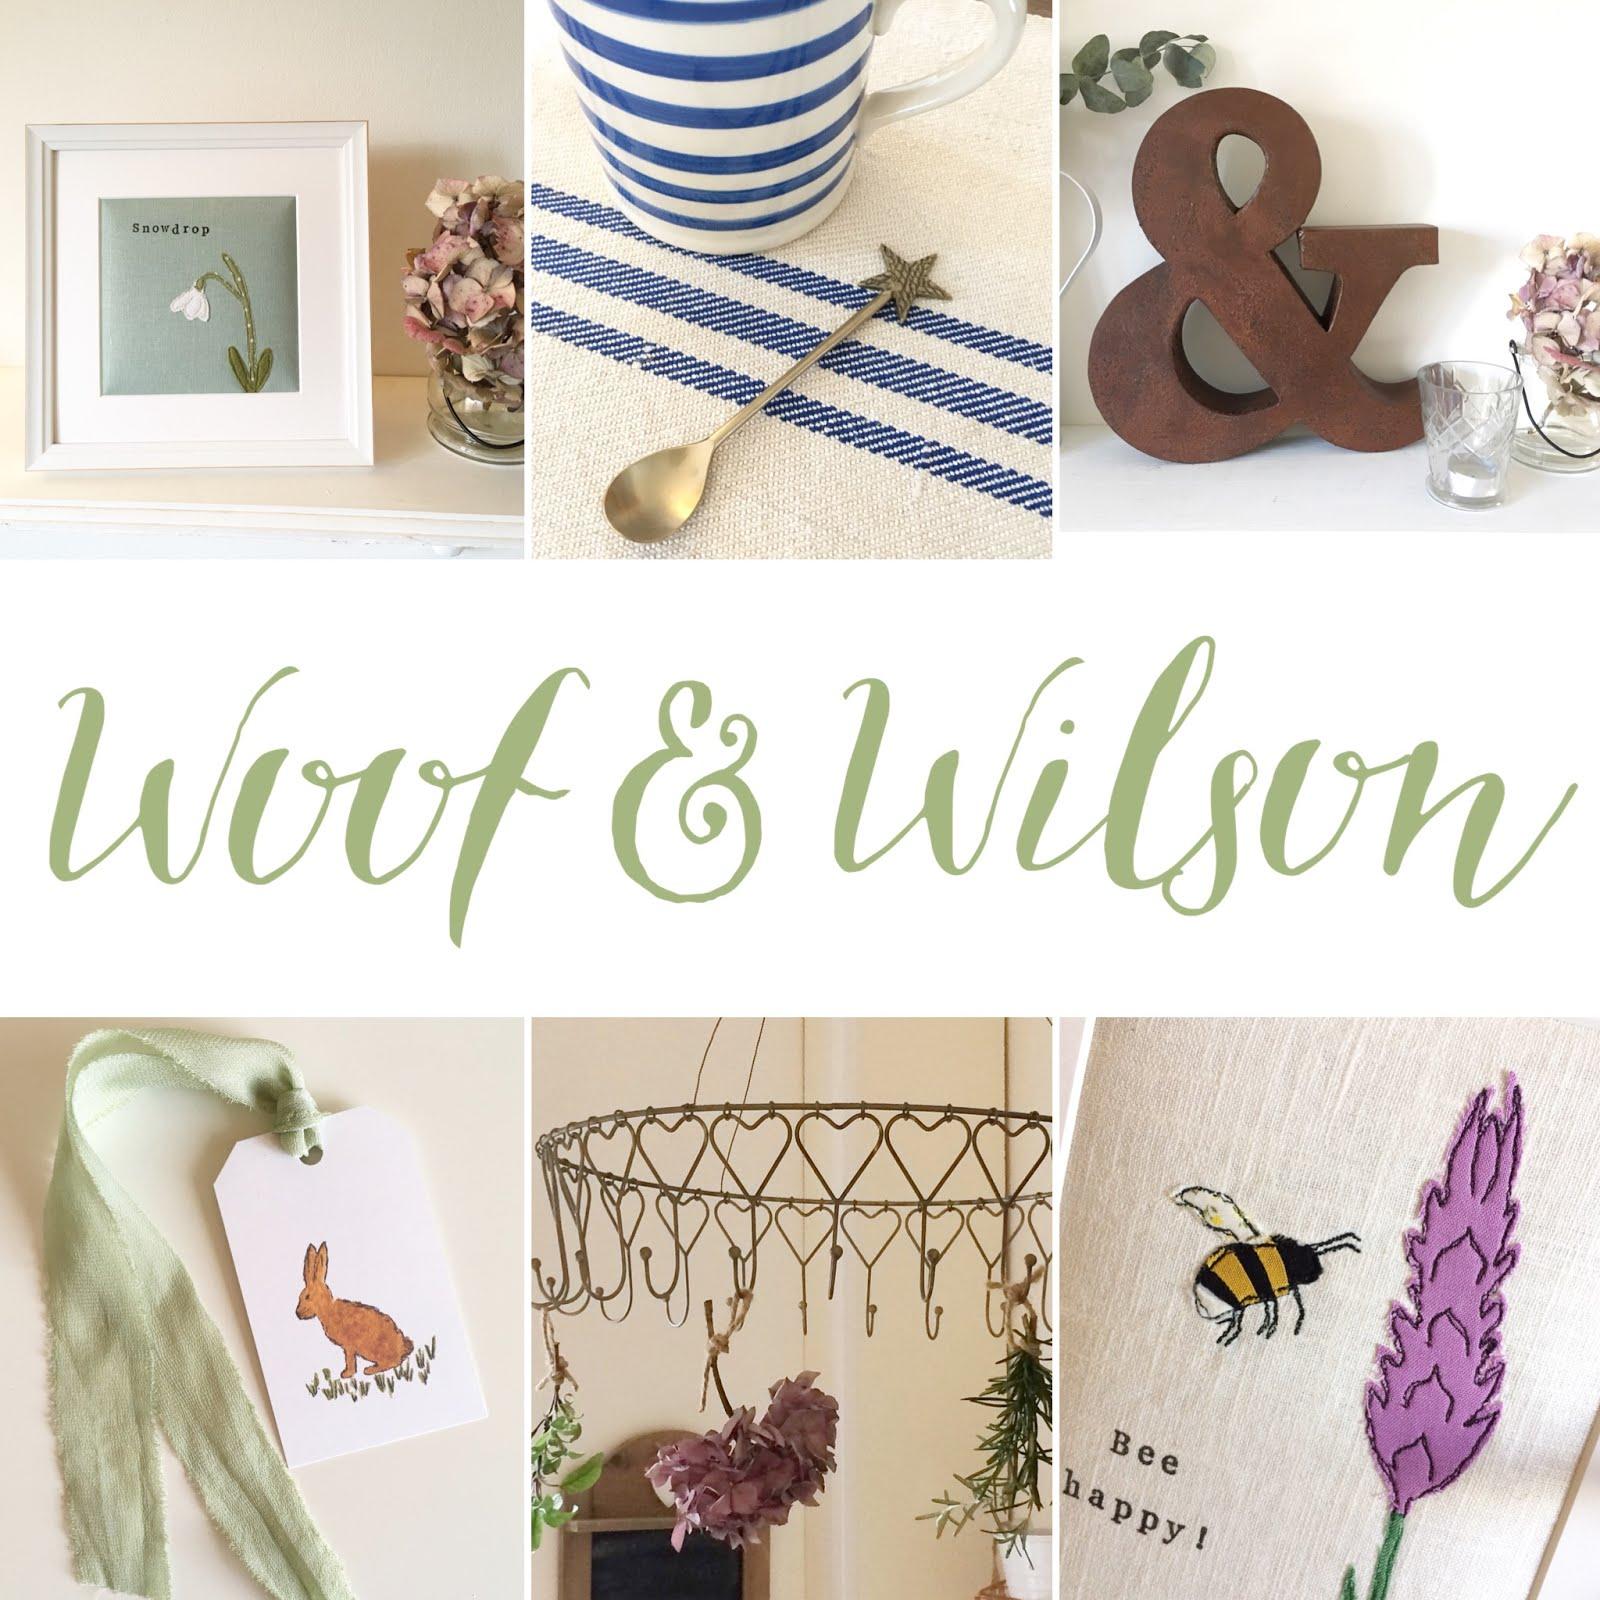 Shop at Woof & Wilson